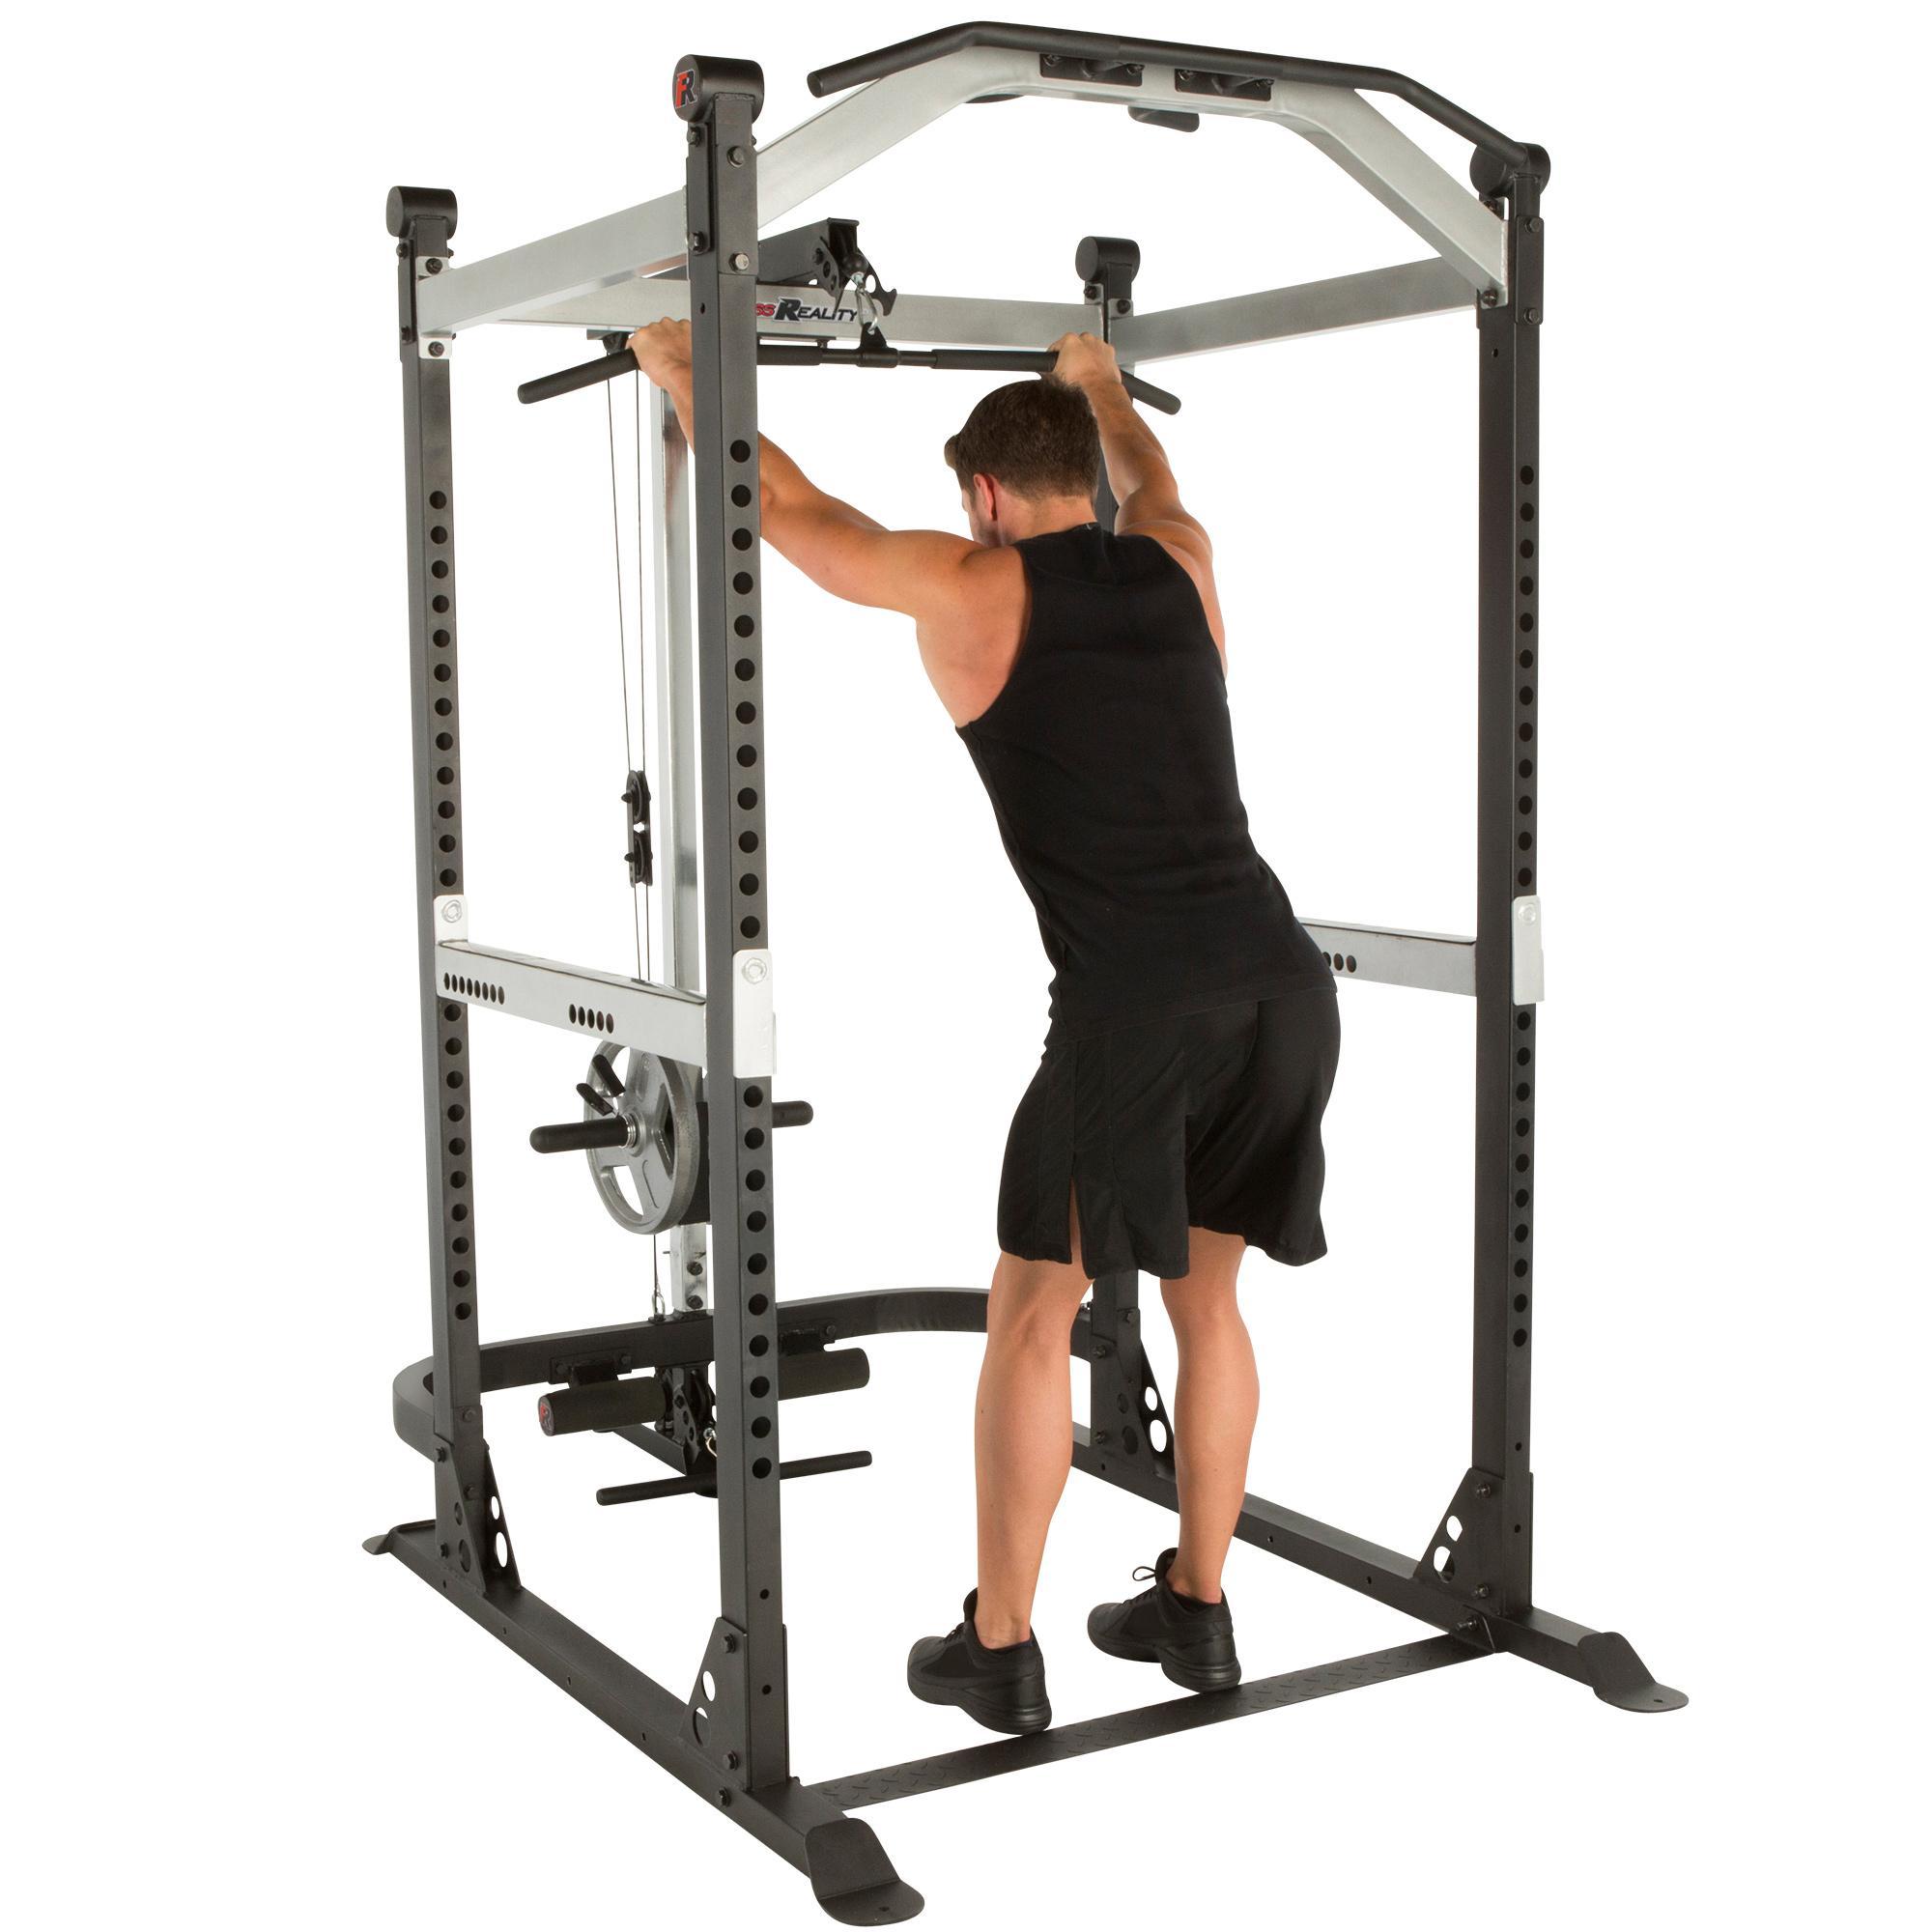 Amazon.com : Fitness Reality X-Class Light Commercial